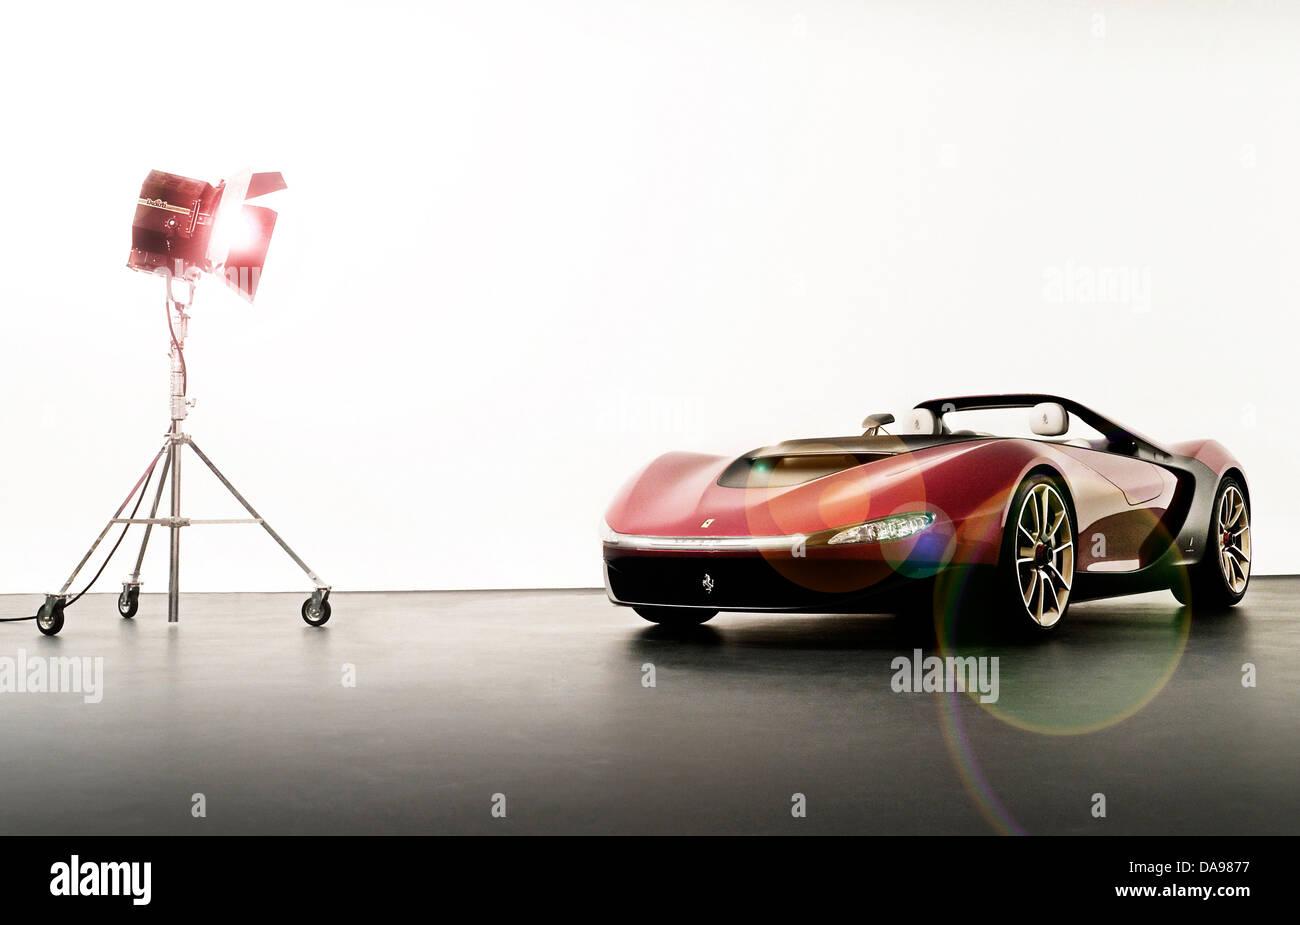 PininFarina Sergio Concept car - Stock Image